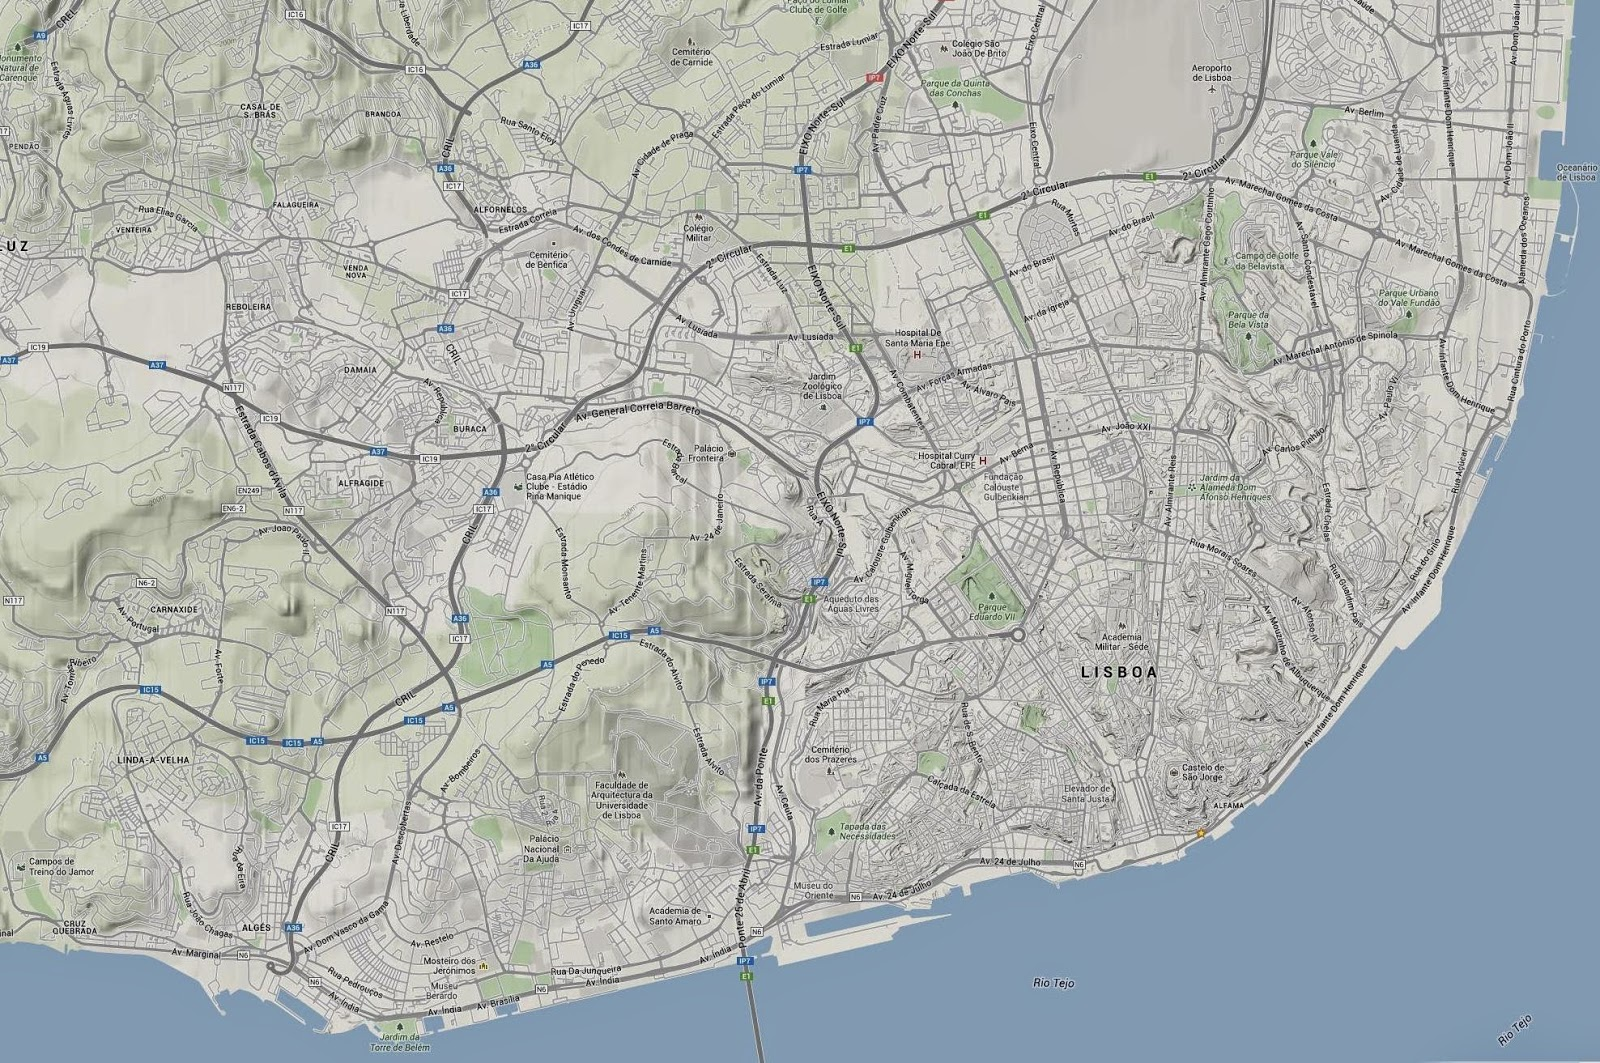 mapa topografico lisboa A bicicleta e o mito das colinas! mapa topografico lisboa